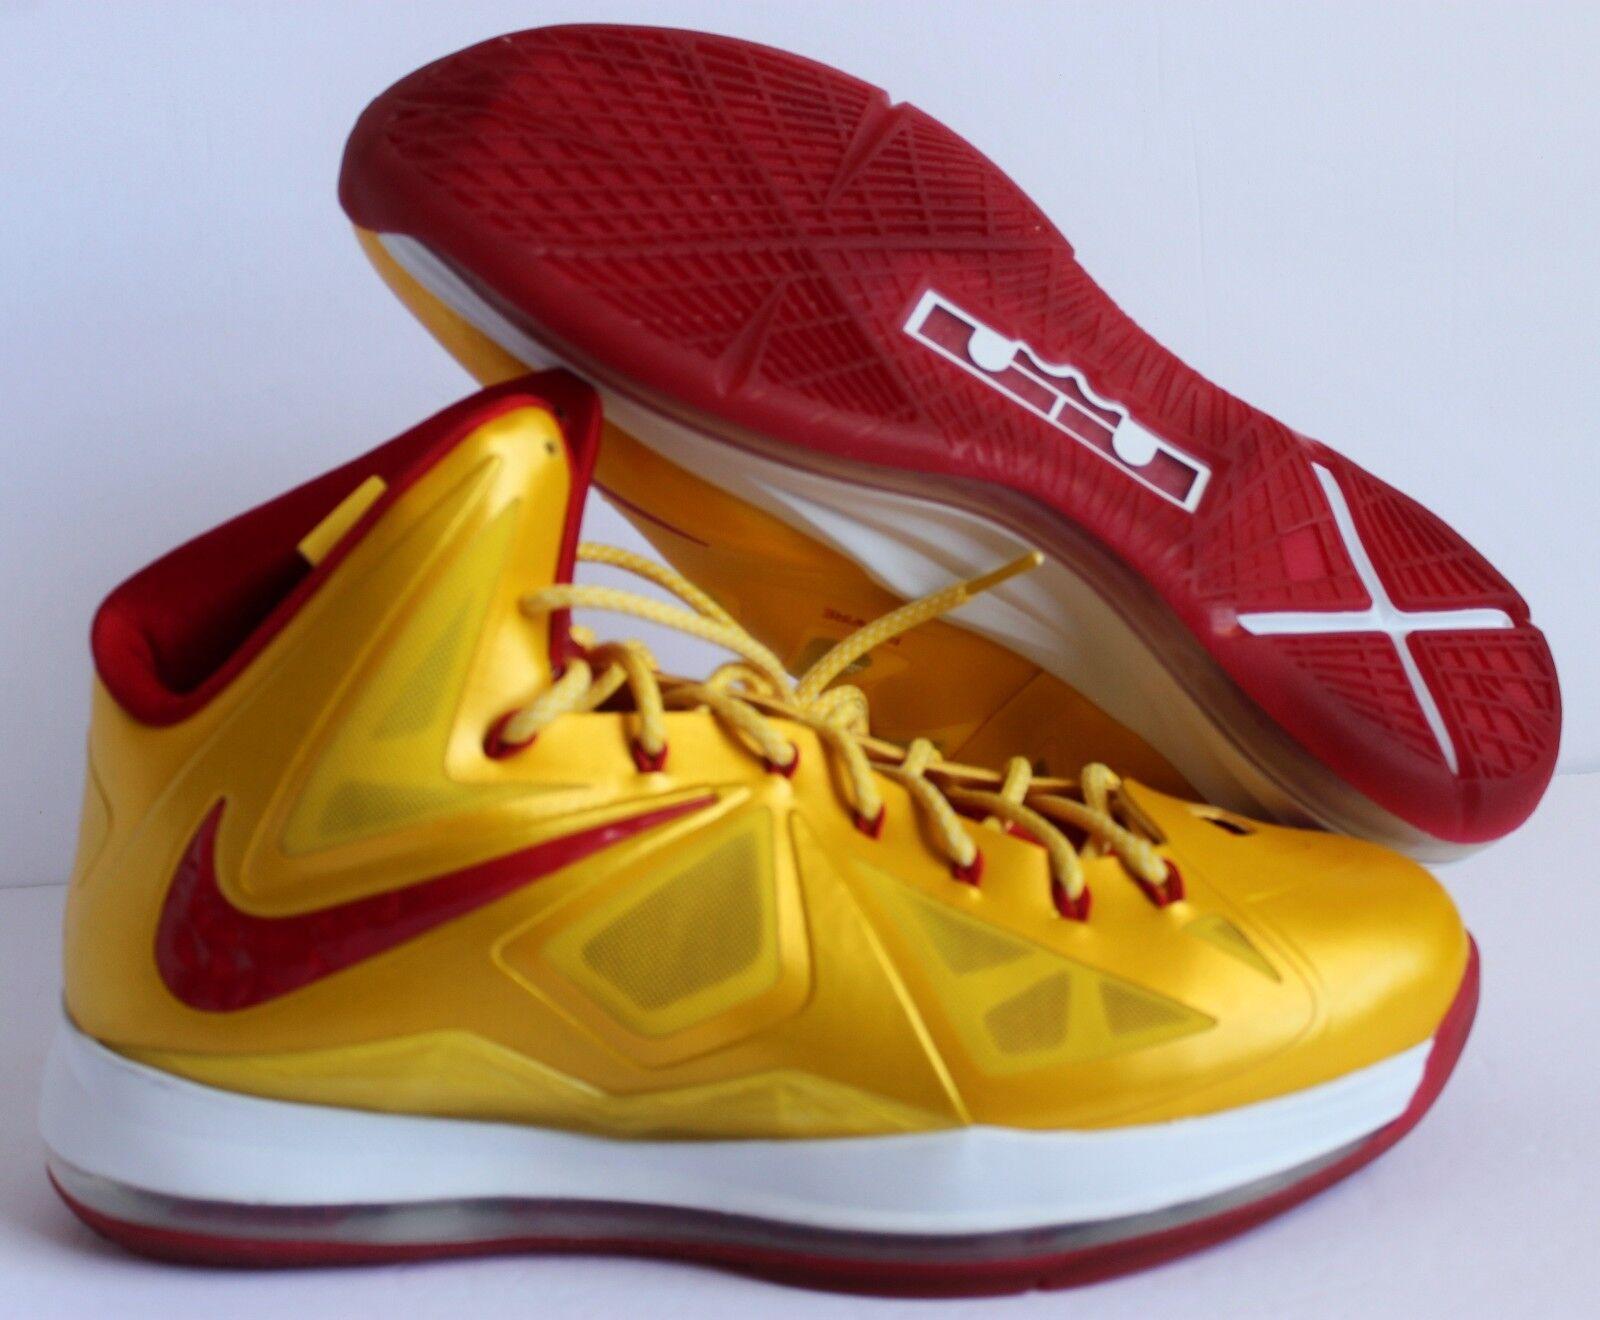 Nike 2013 lebron 10 james yellow-ROT 10 lebron x - id - sz. e975c3